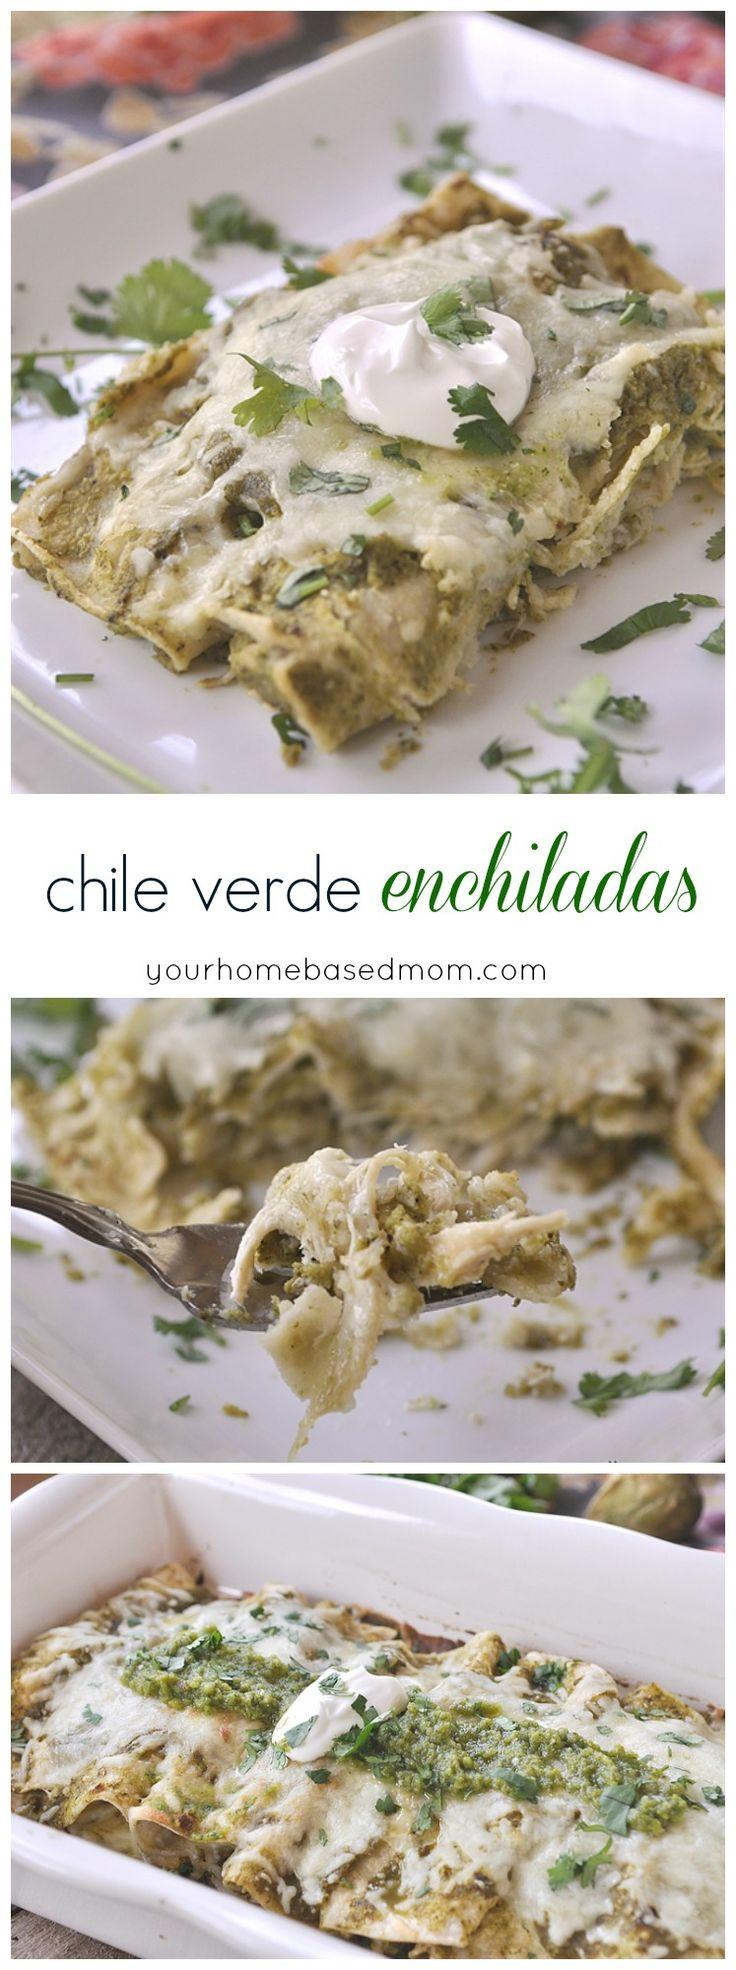 Chile Verde Enchiladas - shredded chicken - white onion - olive oil - garlic clove - salt - cilantro - tomatillos - jalapeno - poblano chile - chicken broth - sugar - corn tortillas - grated Monterey jack cheese